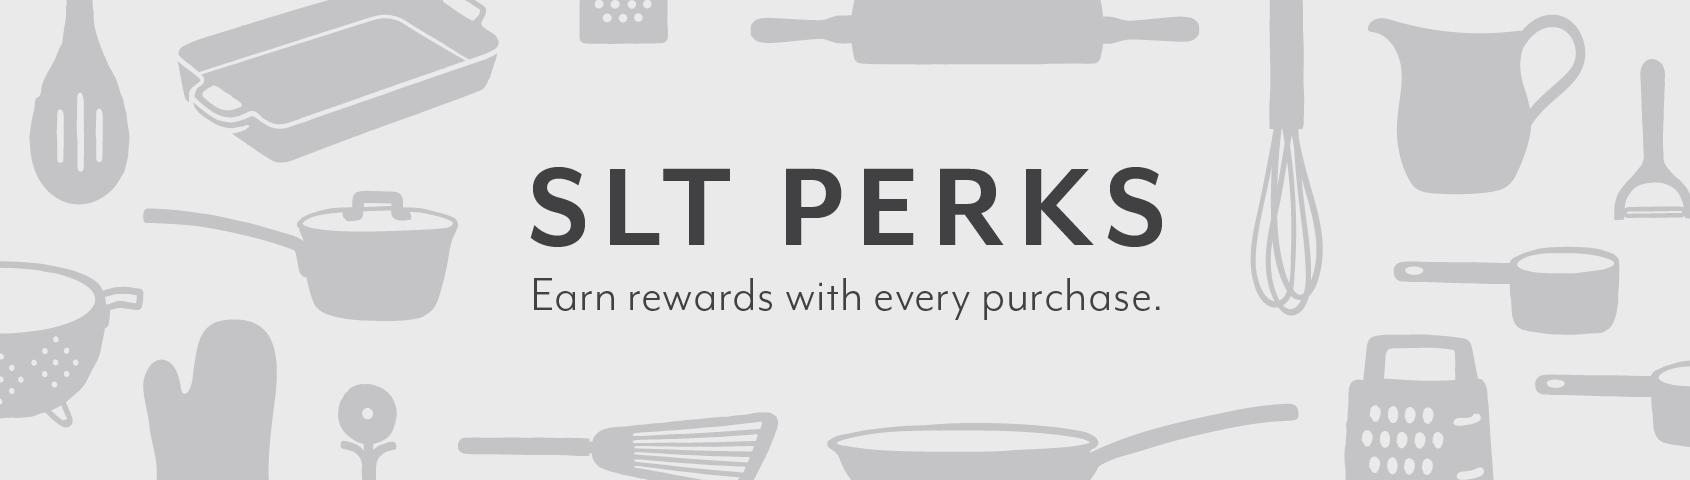 SLT Perks rewards program